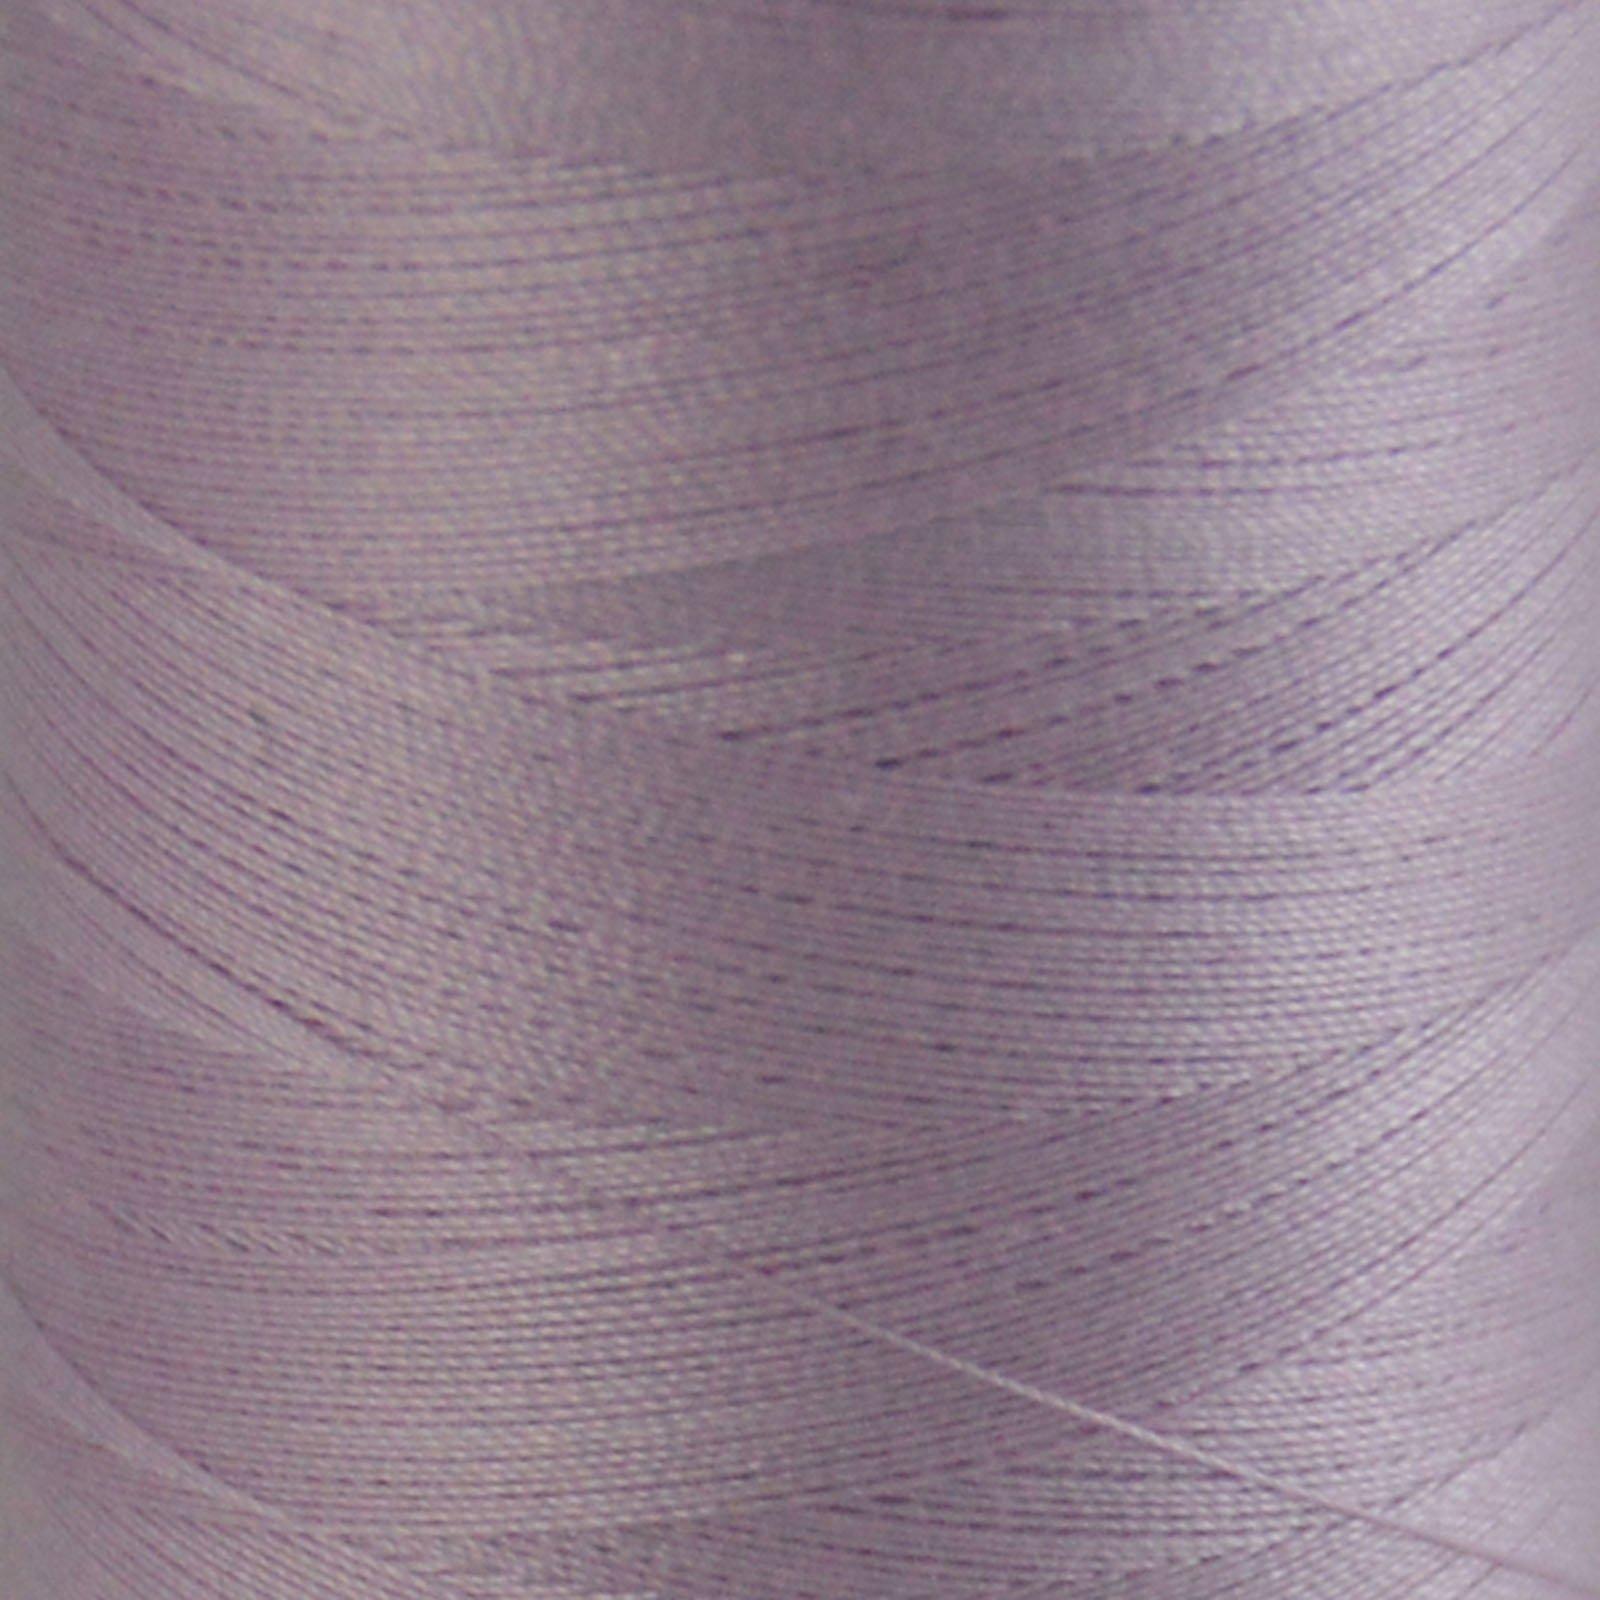 # 2510 Light Lilac